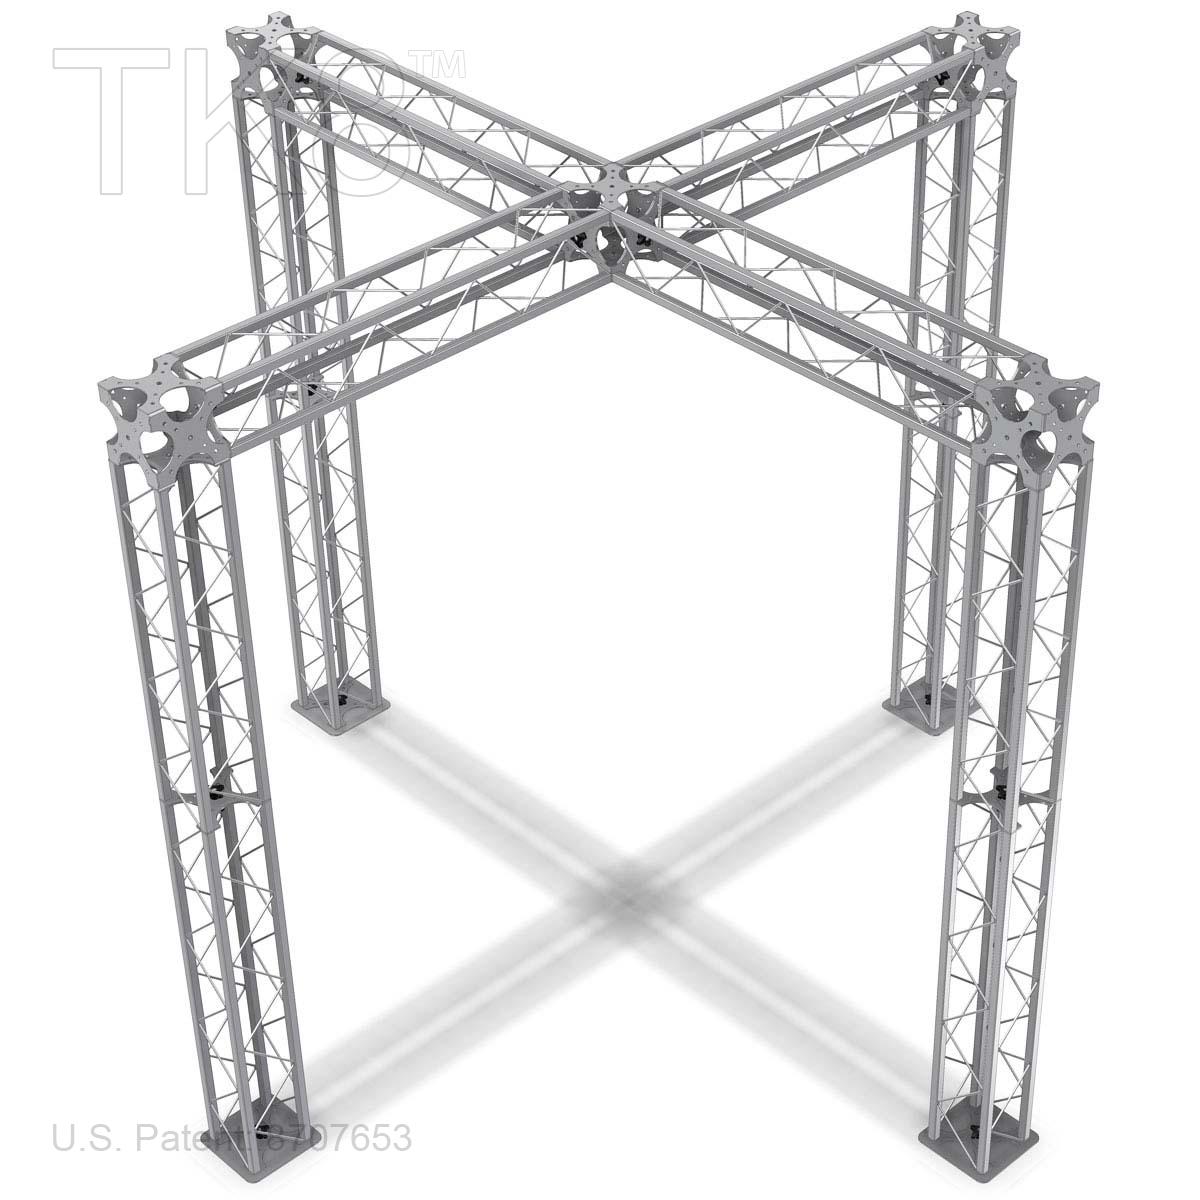 Aiden 10ft x 10ft tk8 aluminum box truss booth for Buy truss